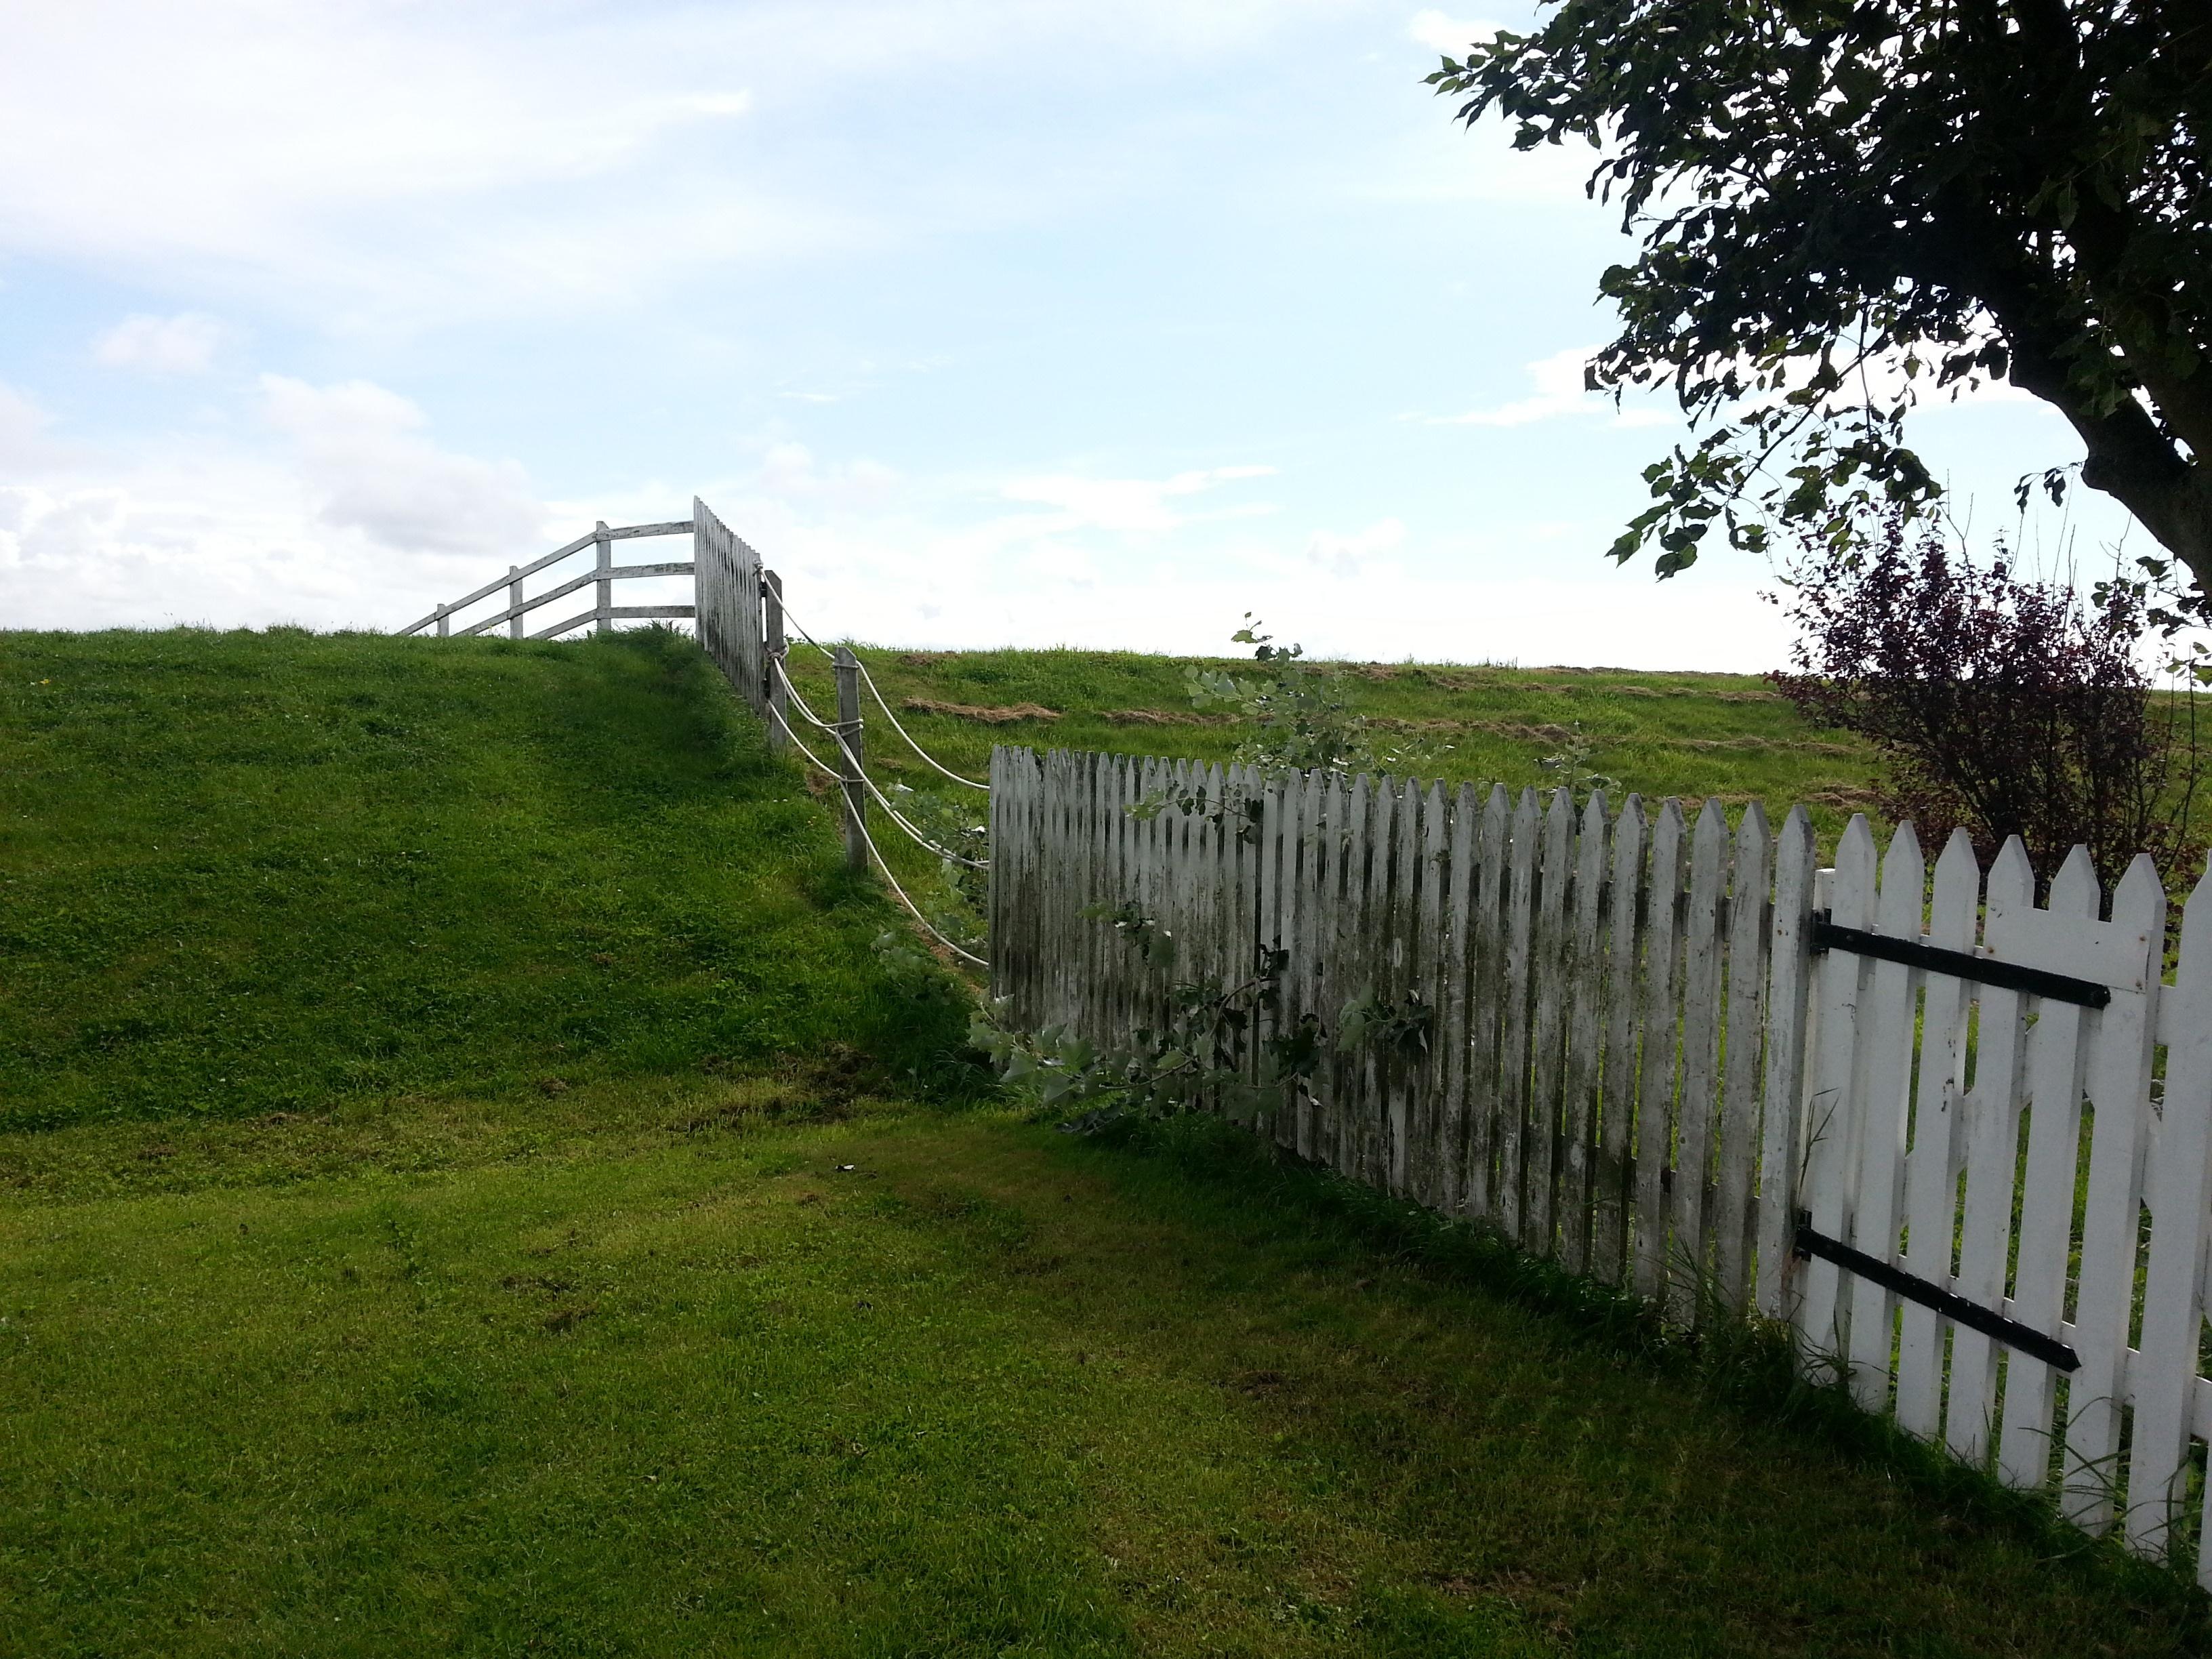 Kostenlose foto Landschaft Gras Zaun Feld Wiese Weide